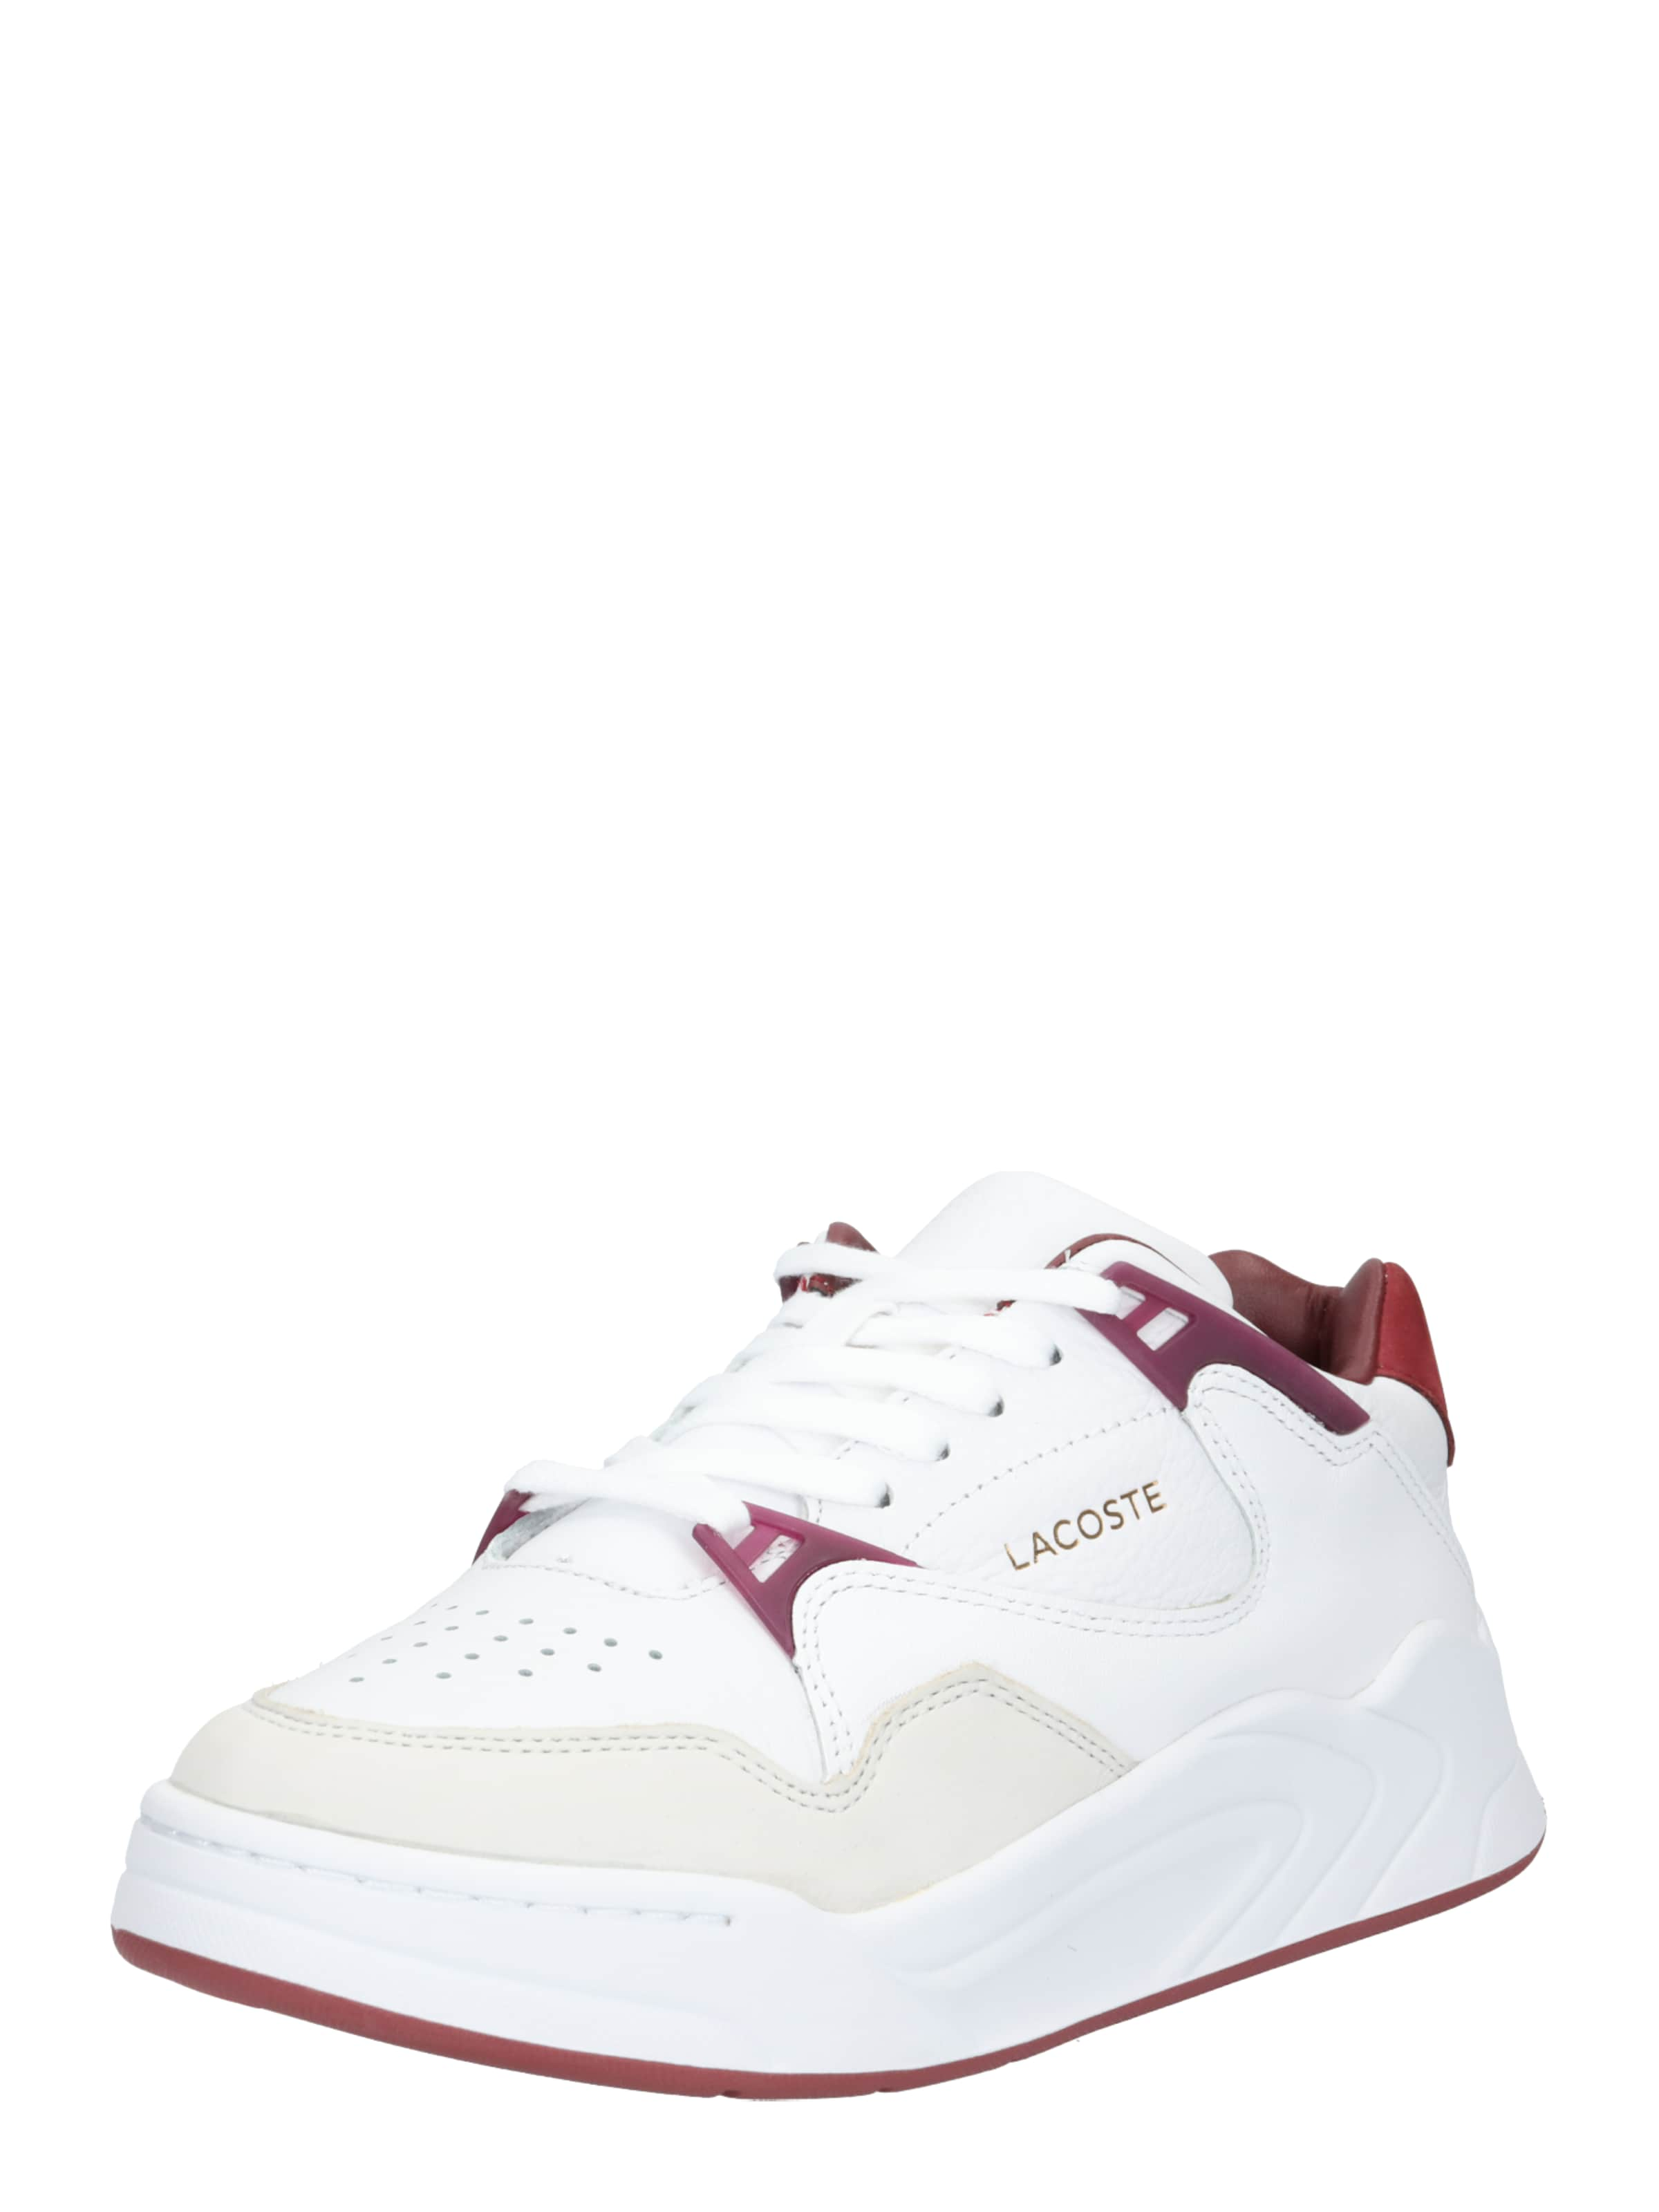 In Sfa' 3 Lacoste 'court Slam 319 Sneaker RotWeiß UMSVpzqG